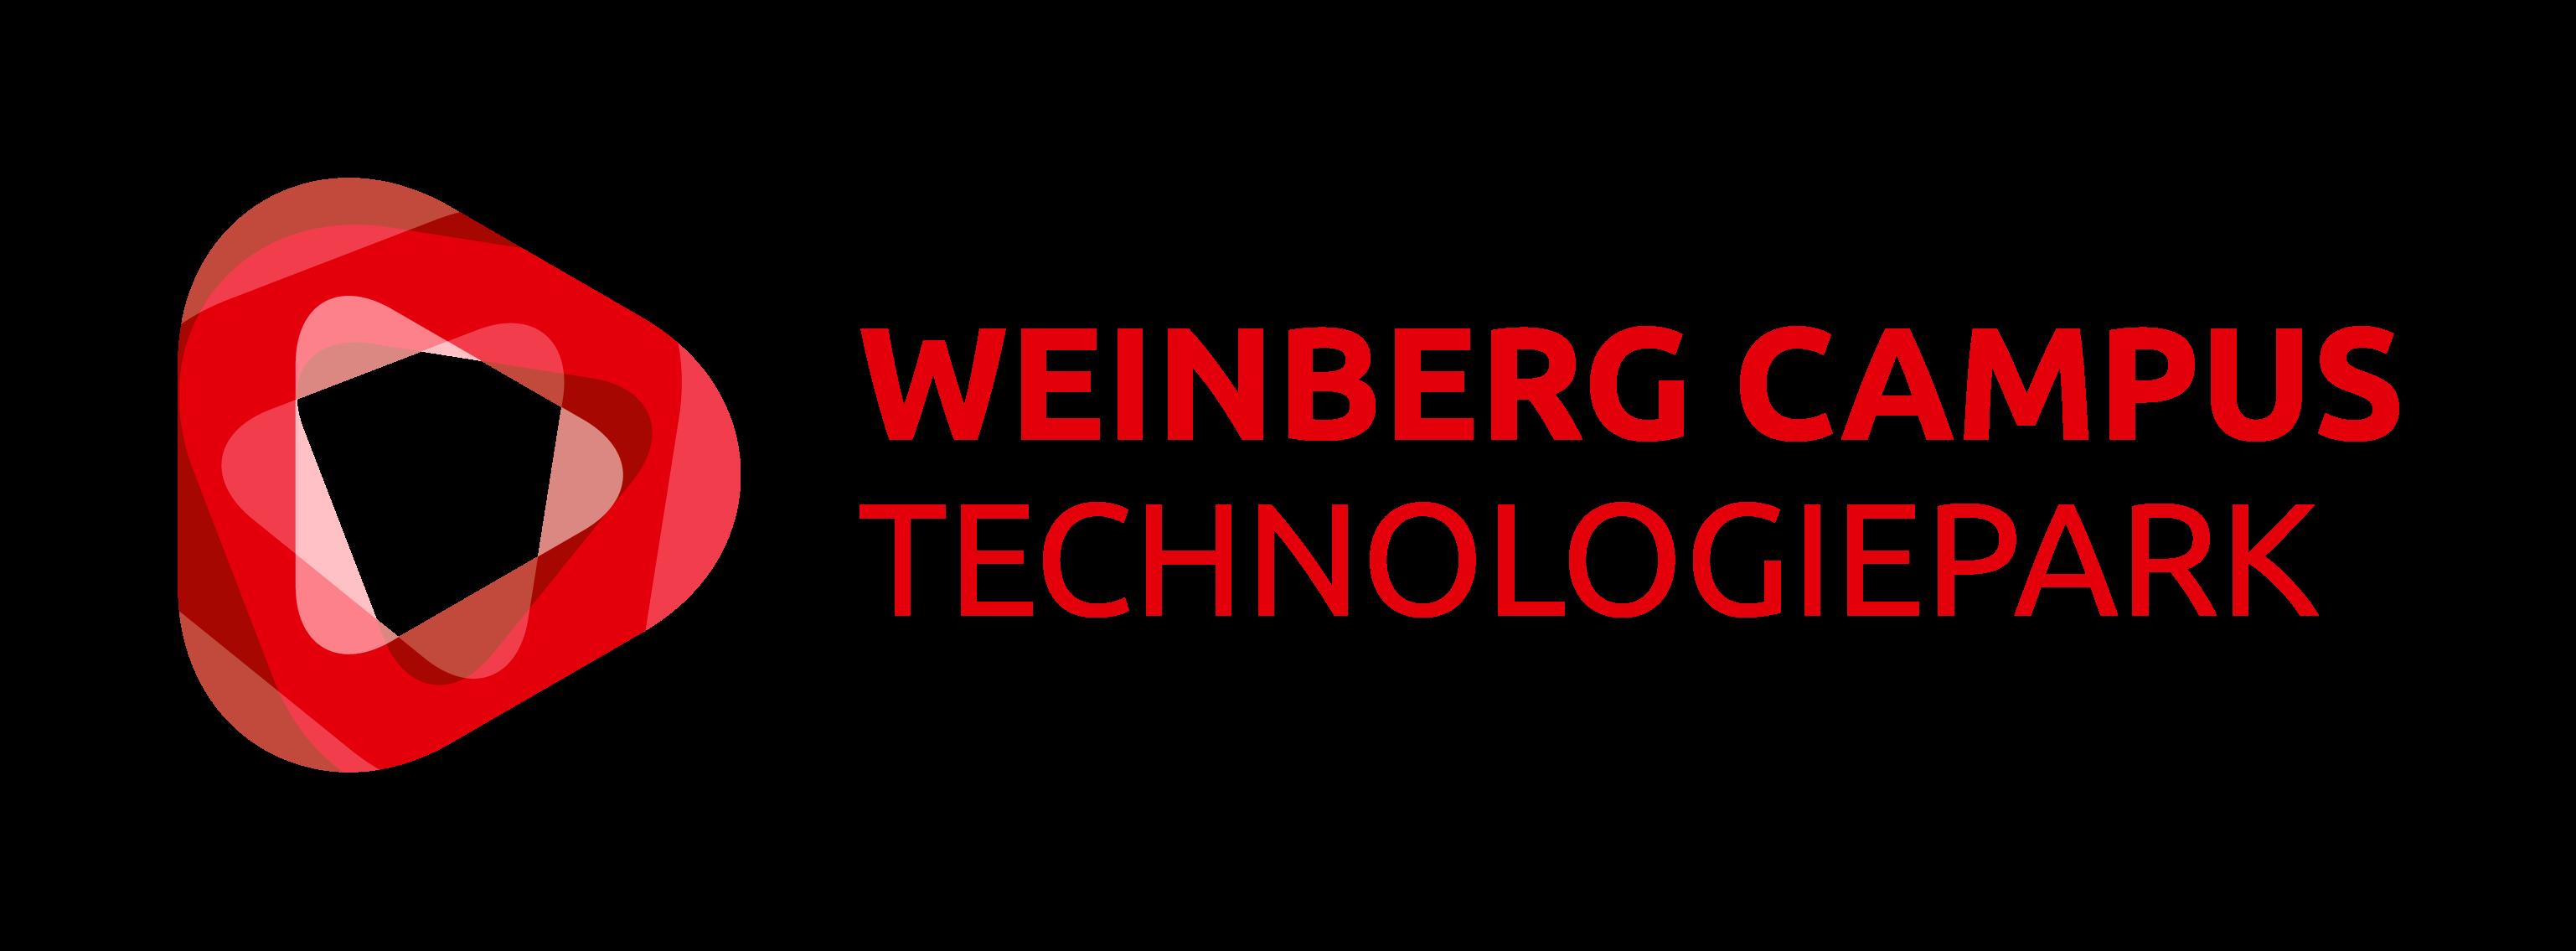 Technologiepark Weinberg Campus></div>  <div class=